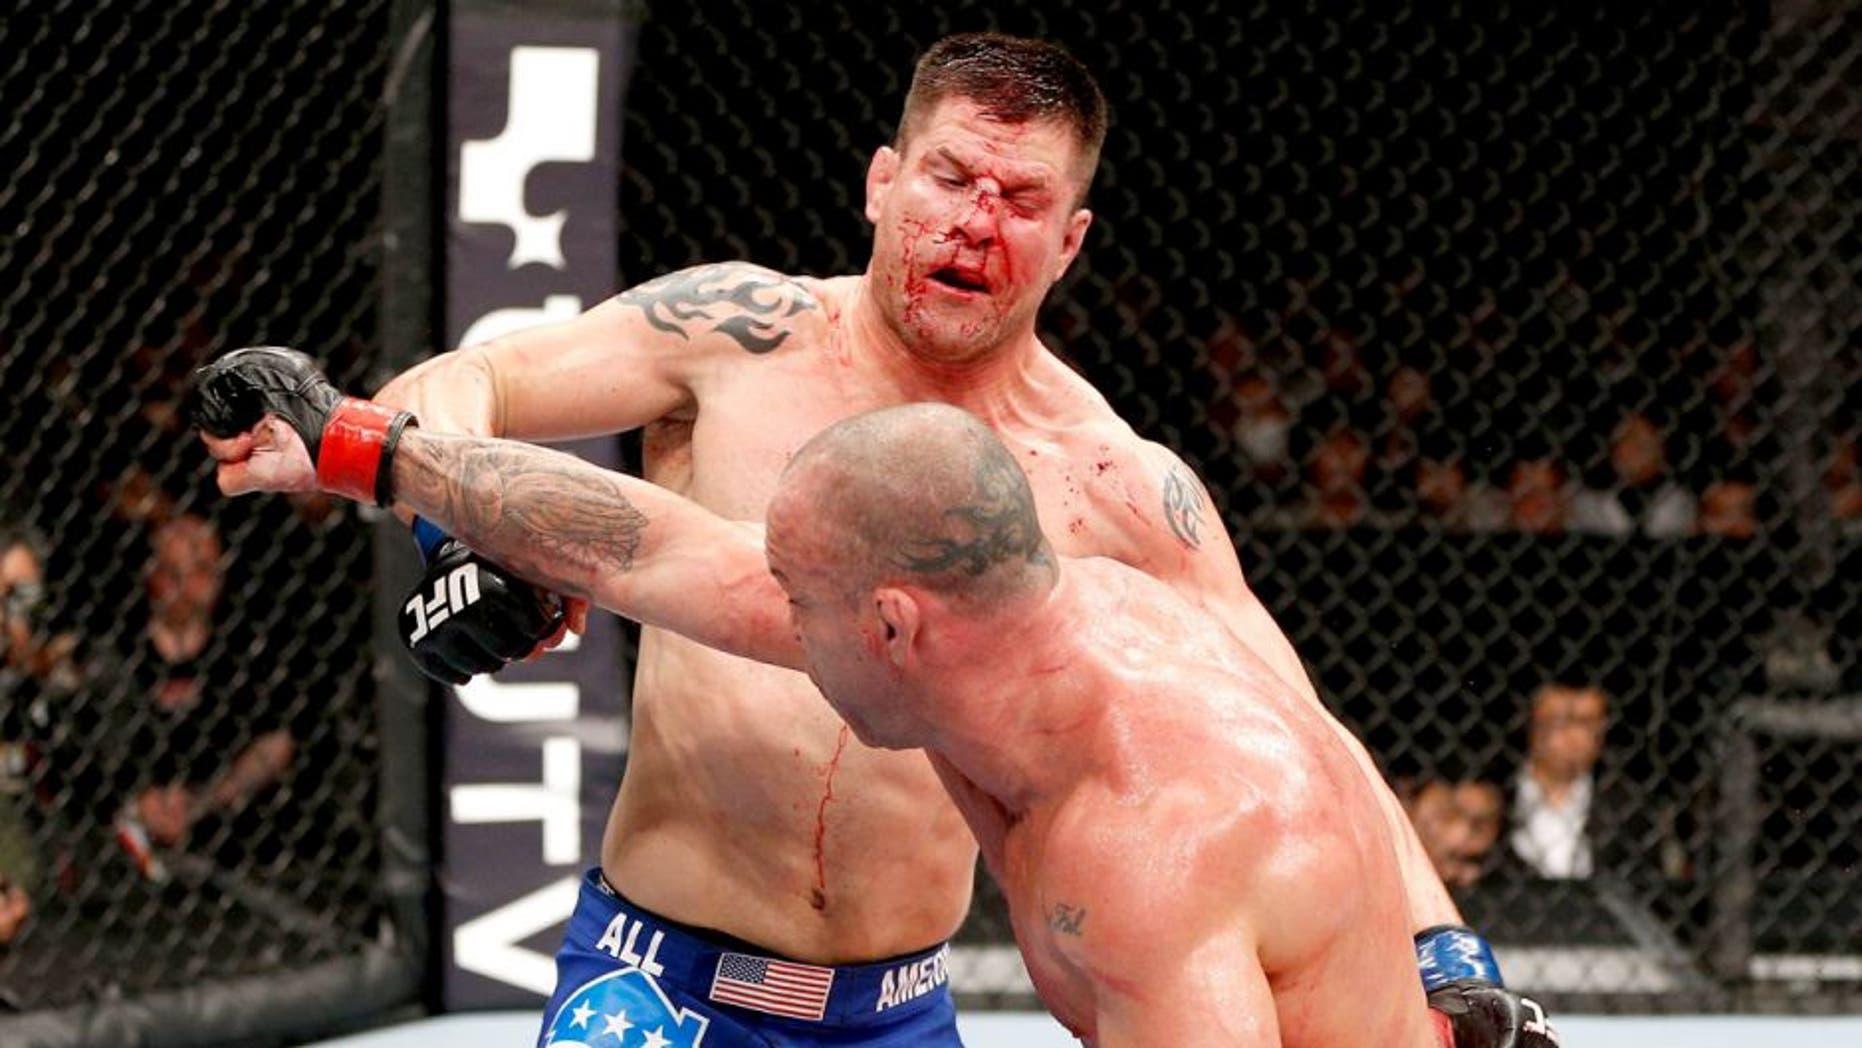 SAITAMA, JAPAN - MARCH 03: (R-L) Wanderlei Silva punches Brian Stann in their light heavyweight fight during the UFC on FUEL TV event at Saitama Super Arena on March 3, 2013 in Saitama, Japan. (Photo by Josh Hedges/Zuffa LLC/Zuffa LLC via Getty Images)